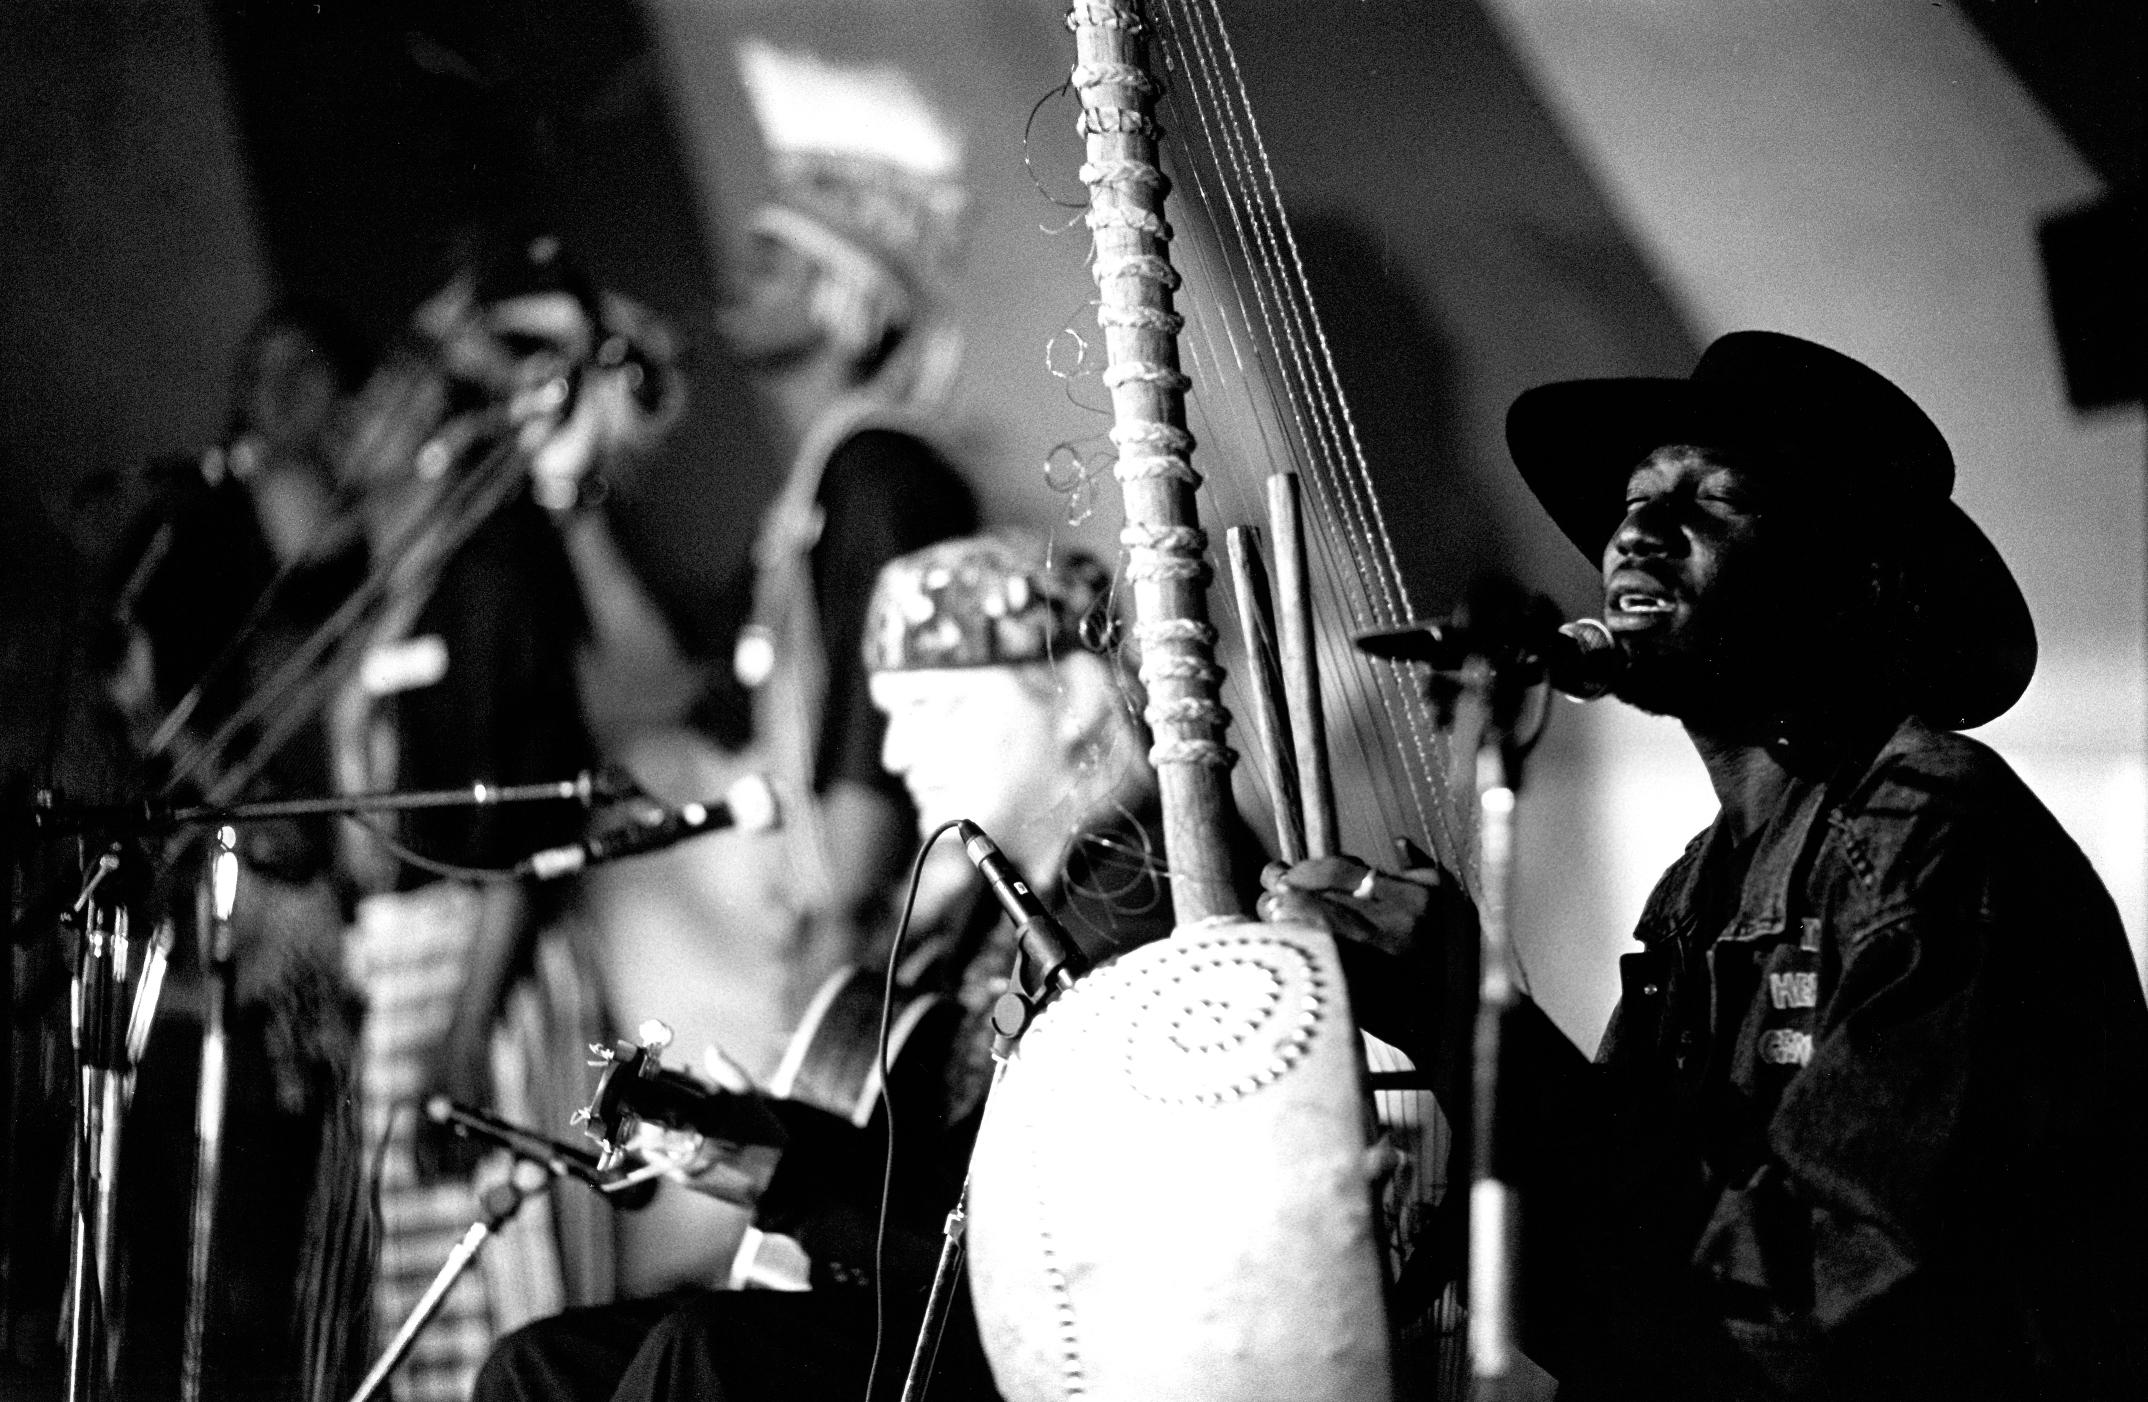 Ein ung Knut Reiersrud med afrikanarane Alagi M'bye og Juldeh Camara spelte på Telemarkfestivalen i 1992. Foto: Arkivfoto.